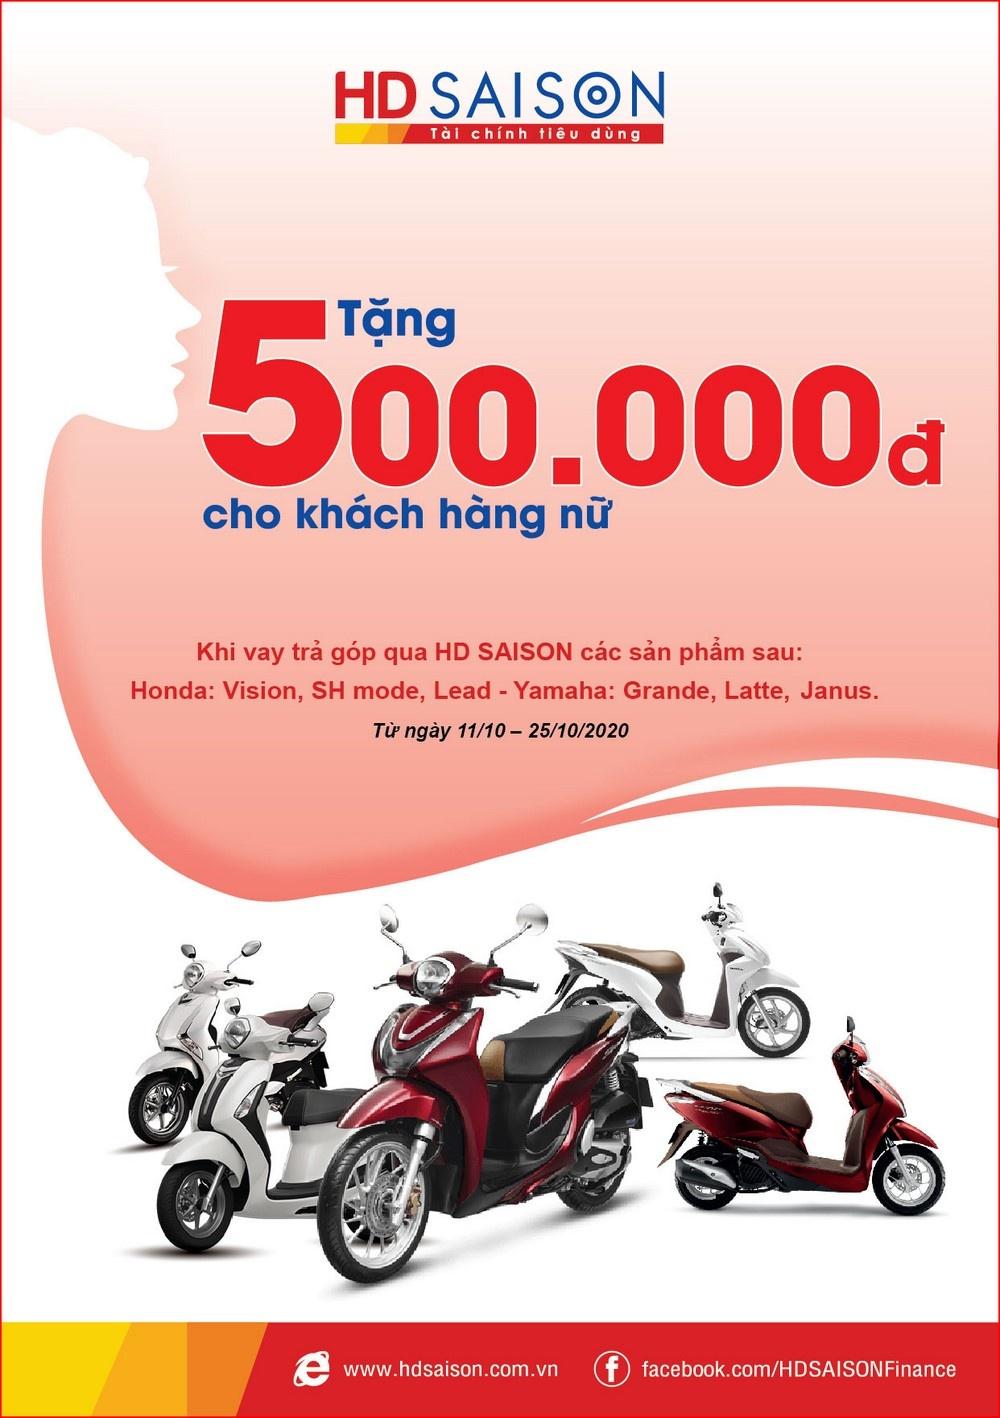 hd saison tang qua khach hang nu nhan dip 2010